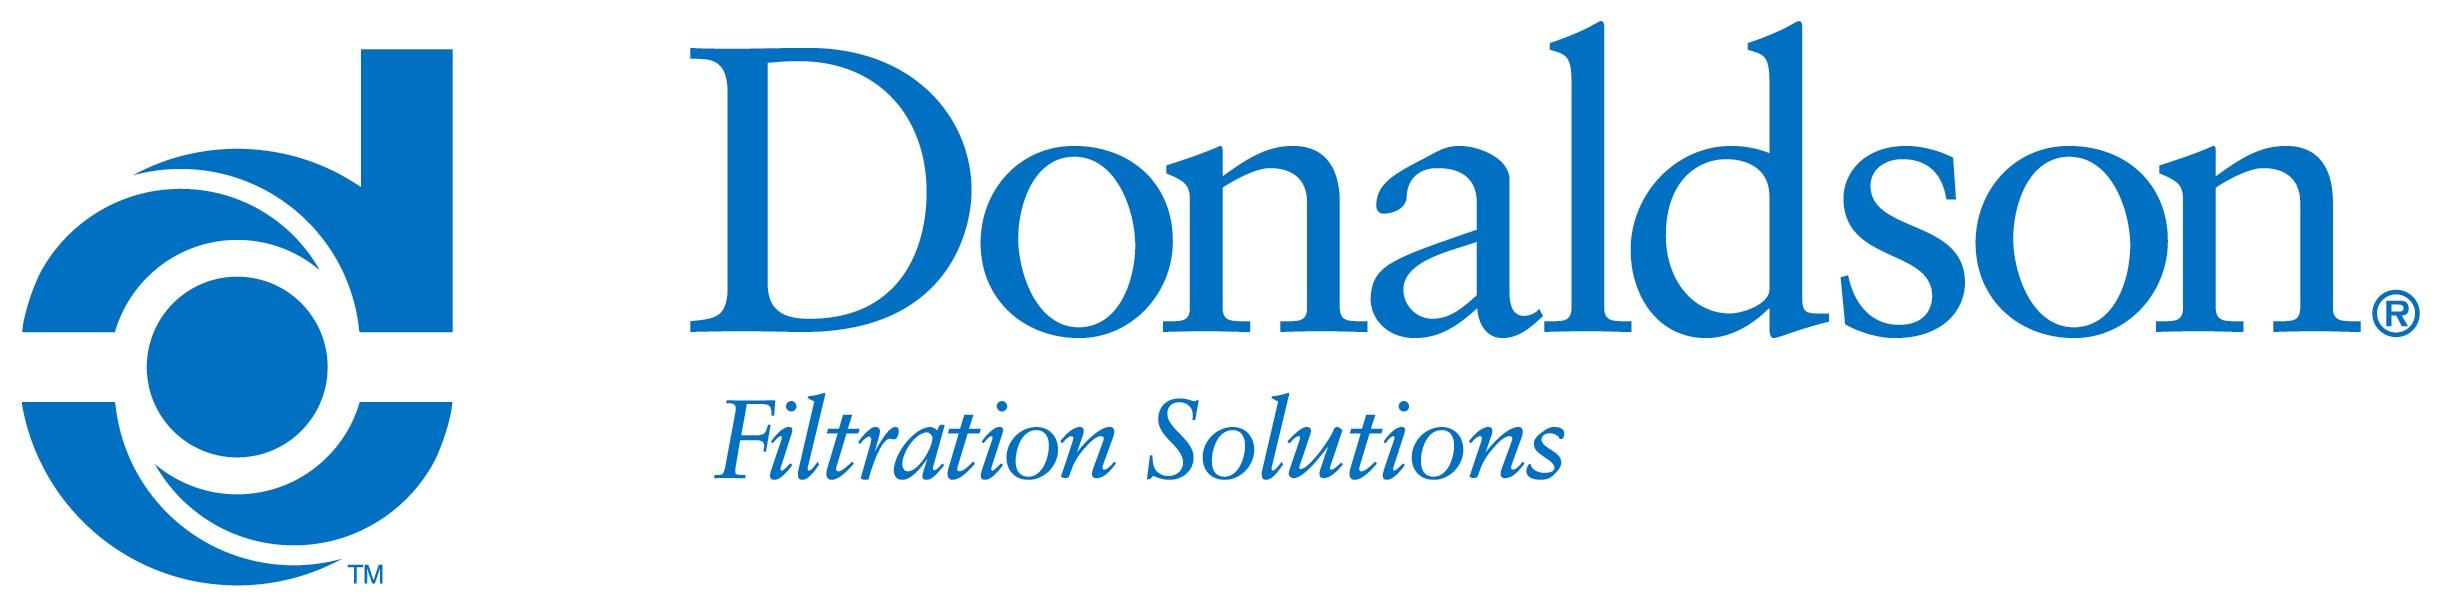 Donaldson-Filtration-Solutions-Logo